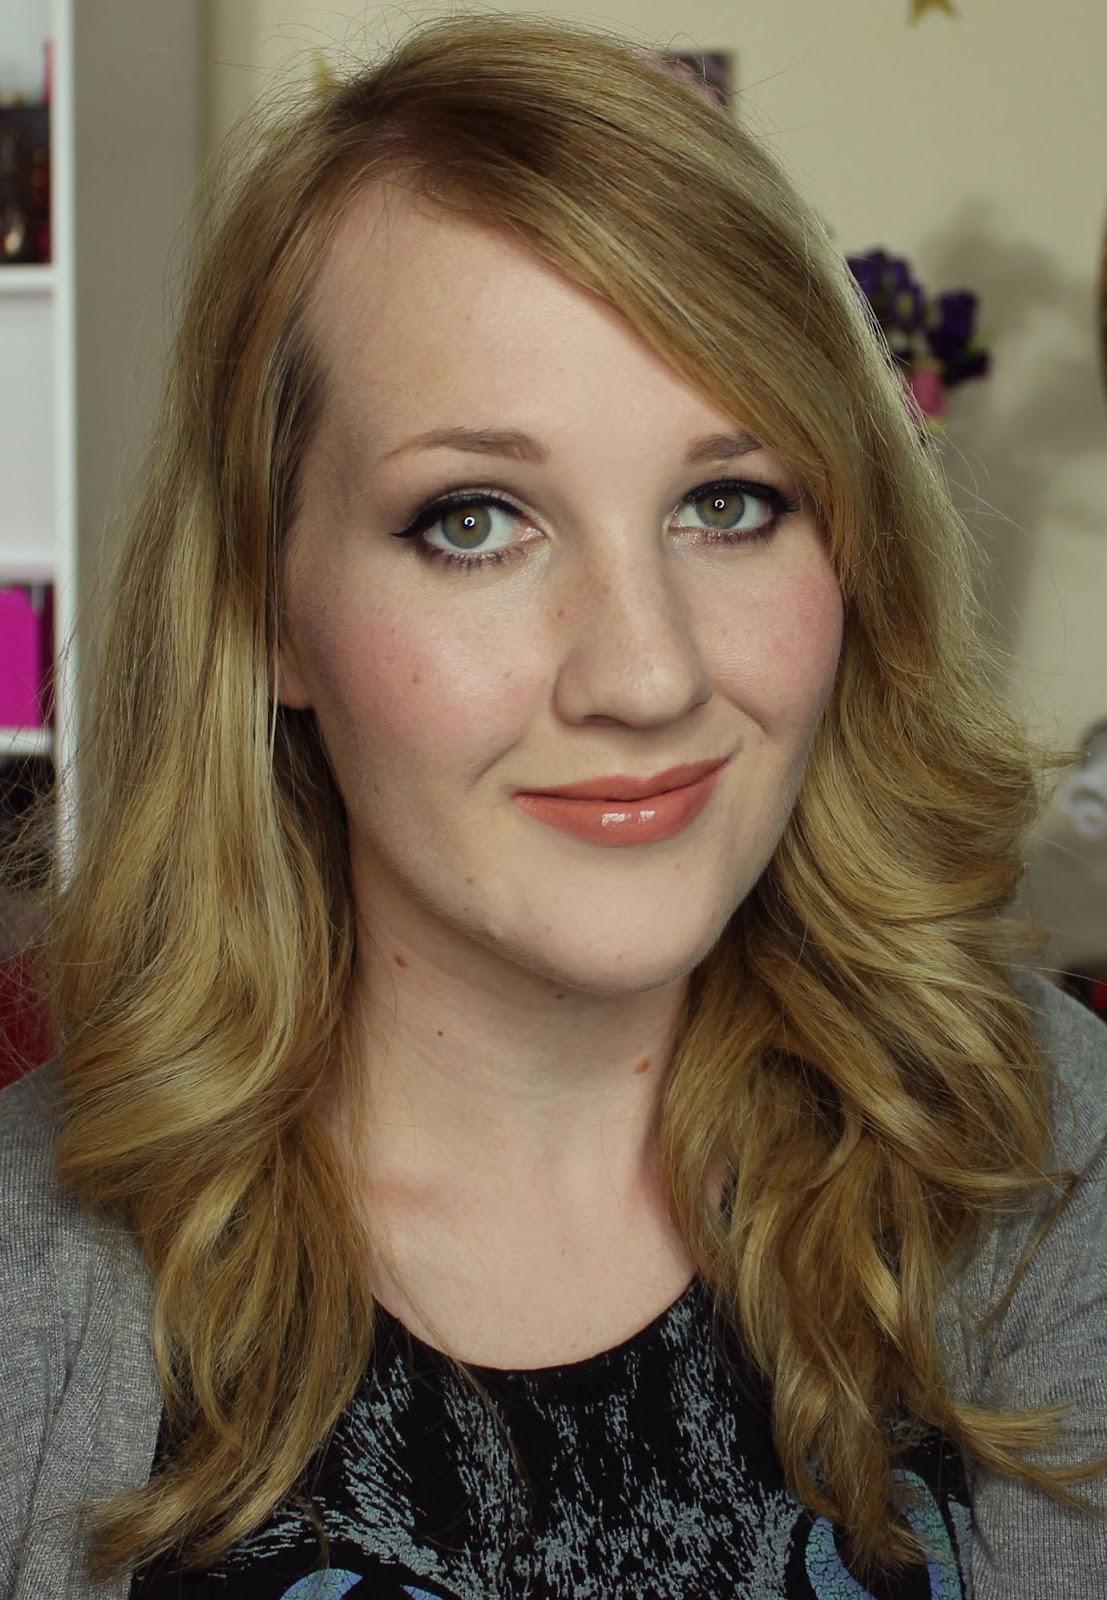 ZA Vibrant Moist Lipstick - BE222 swatches & review